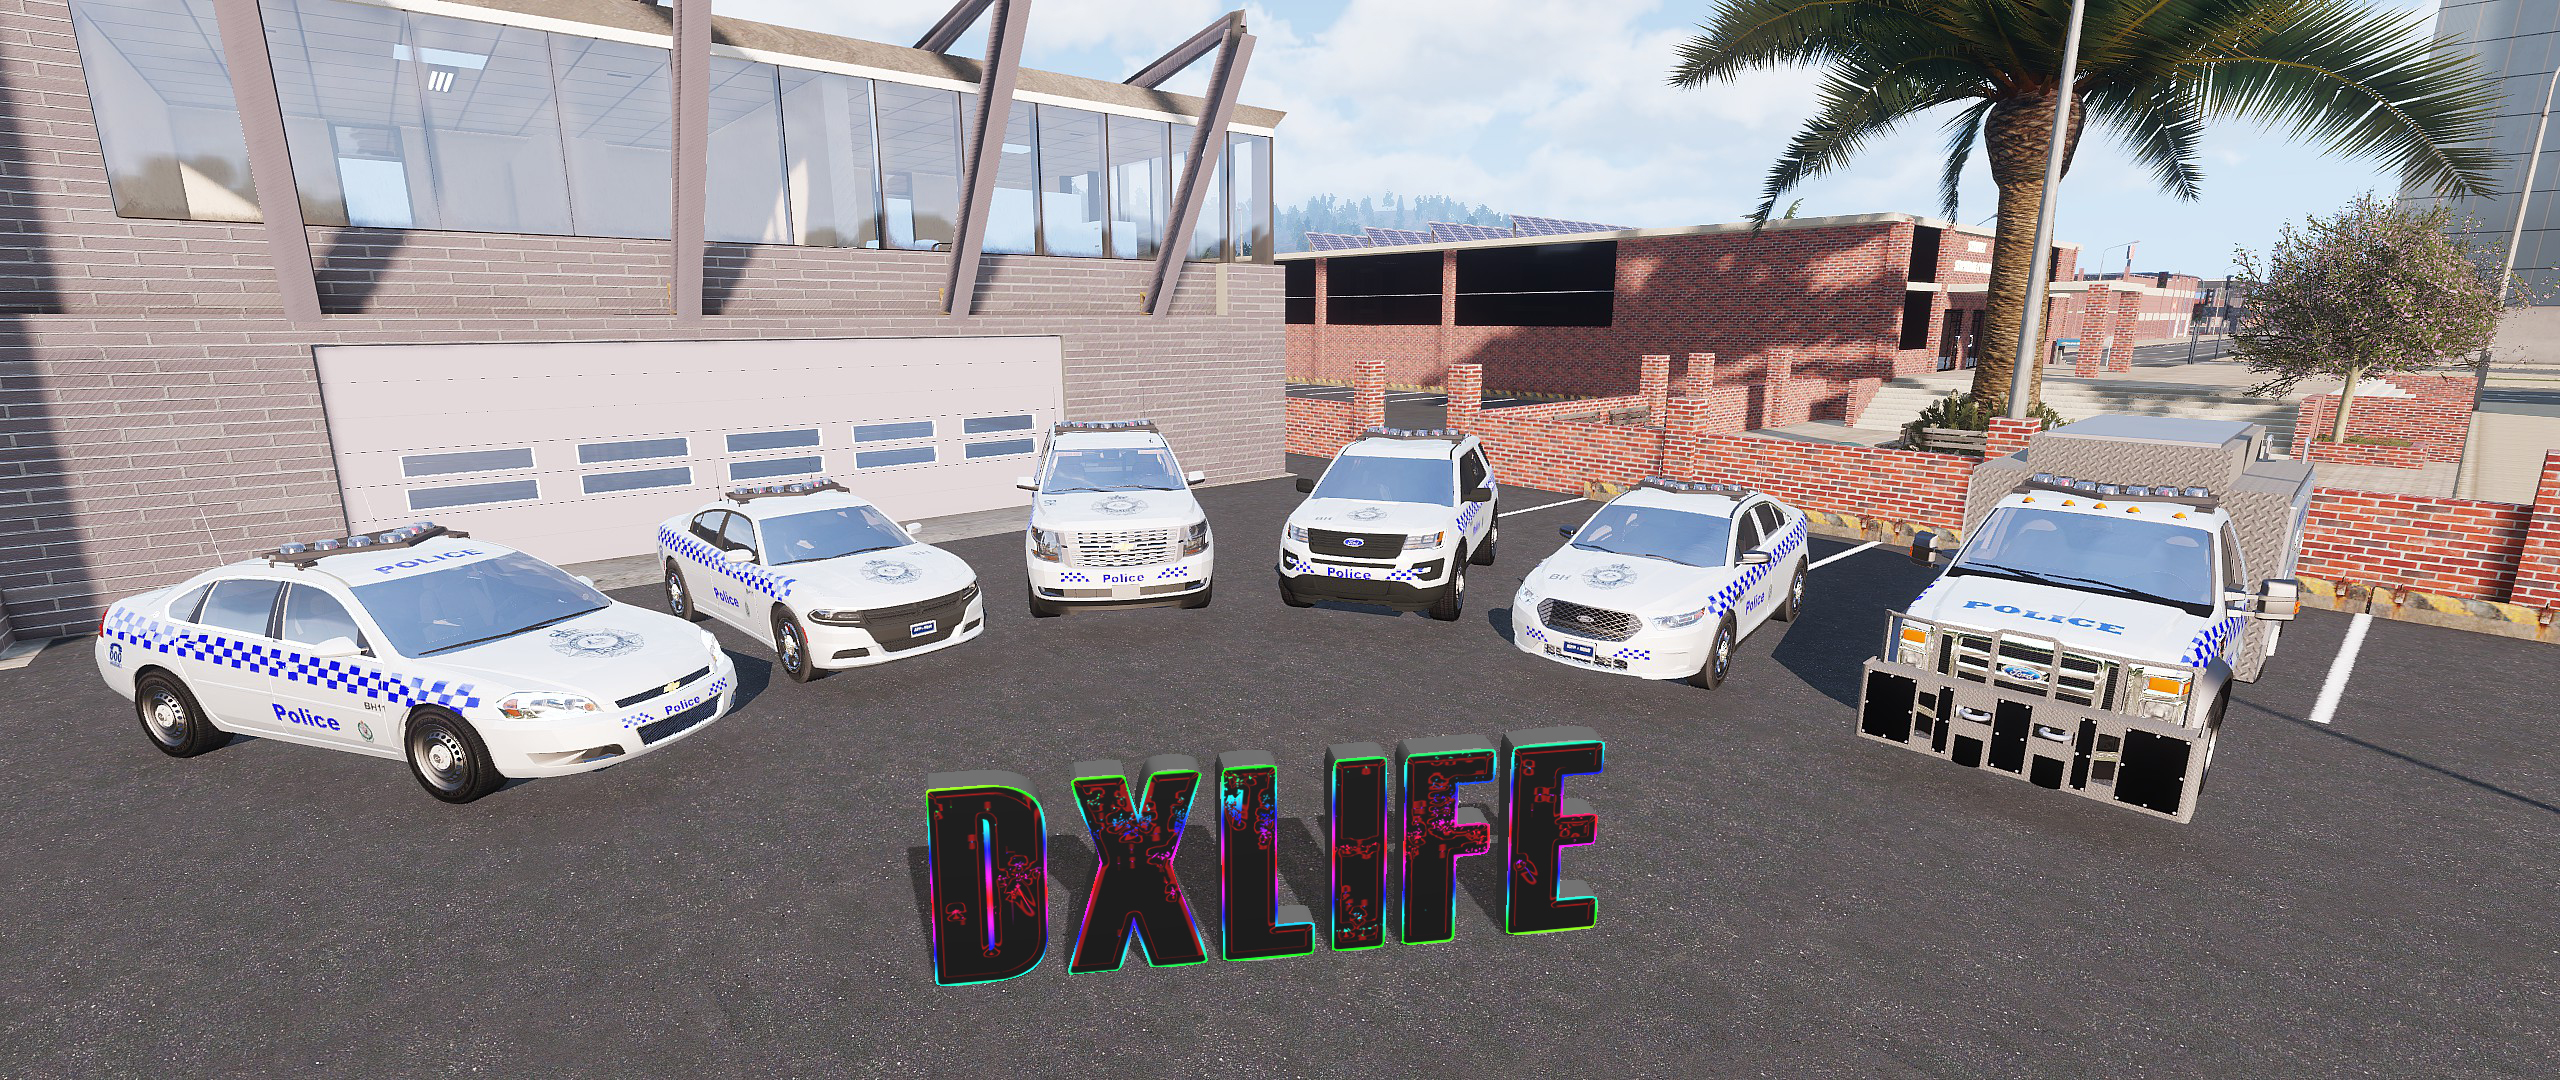 Police-Photo3d.jpg